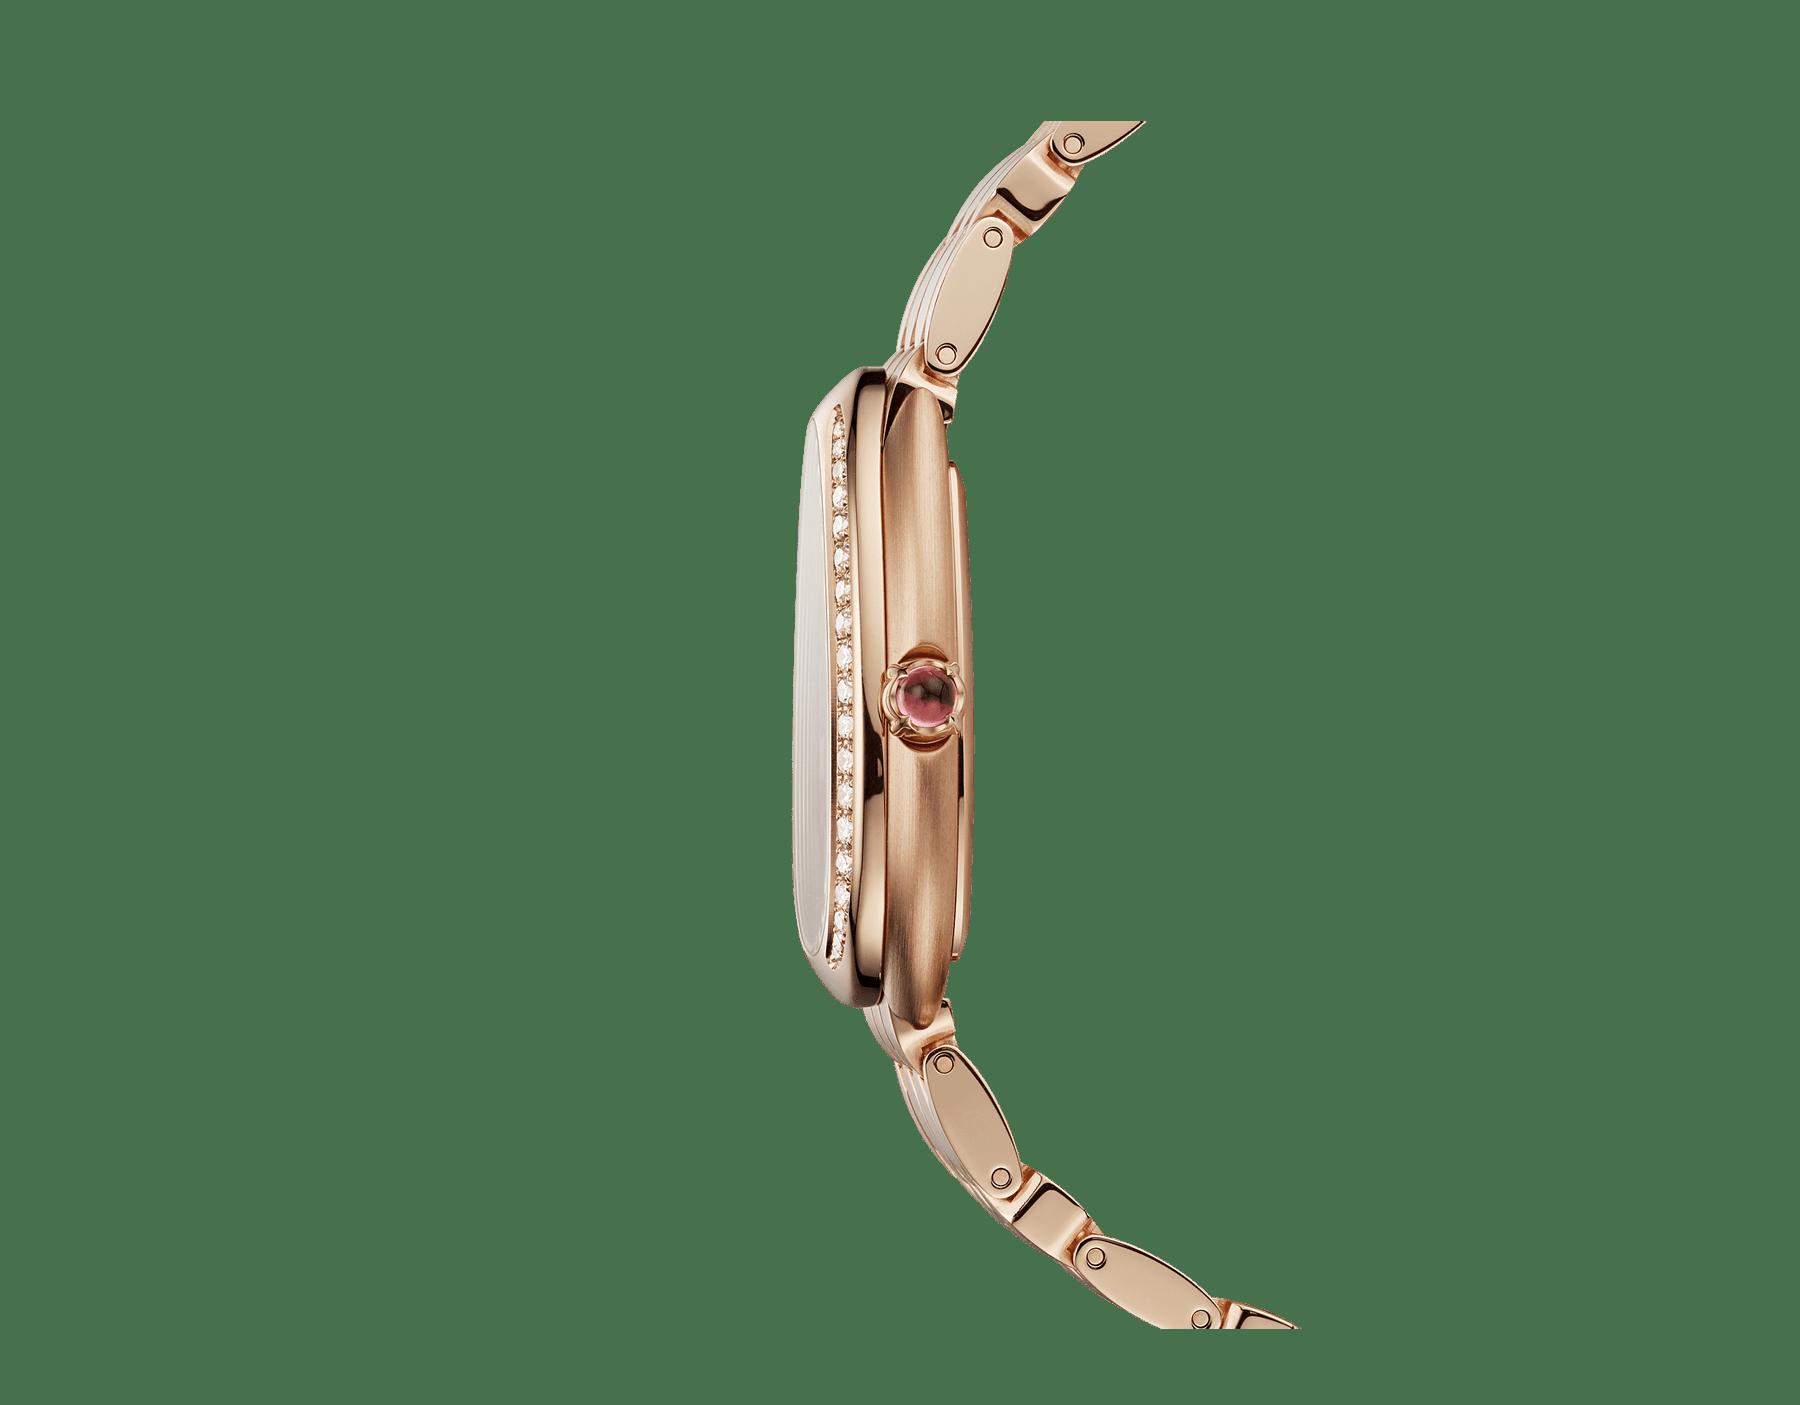 Serpenti Seduttori 腕錶,18K 玫瑰金錶殼和錶圈鑲飾鑽石,銀白色蛋白石錶盤,18K 玫瑰金髮絲紋錶帶。 103169 image 3